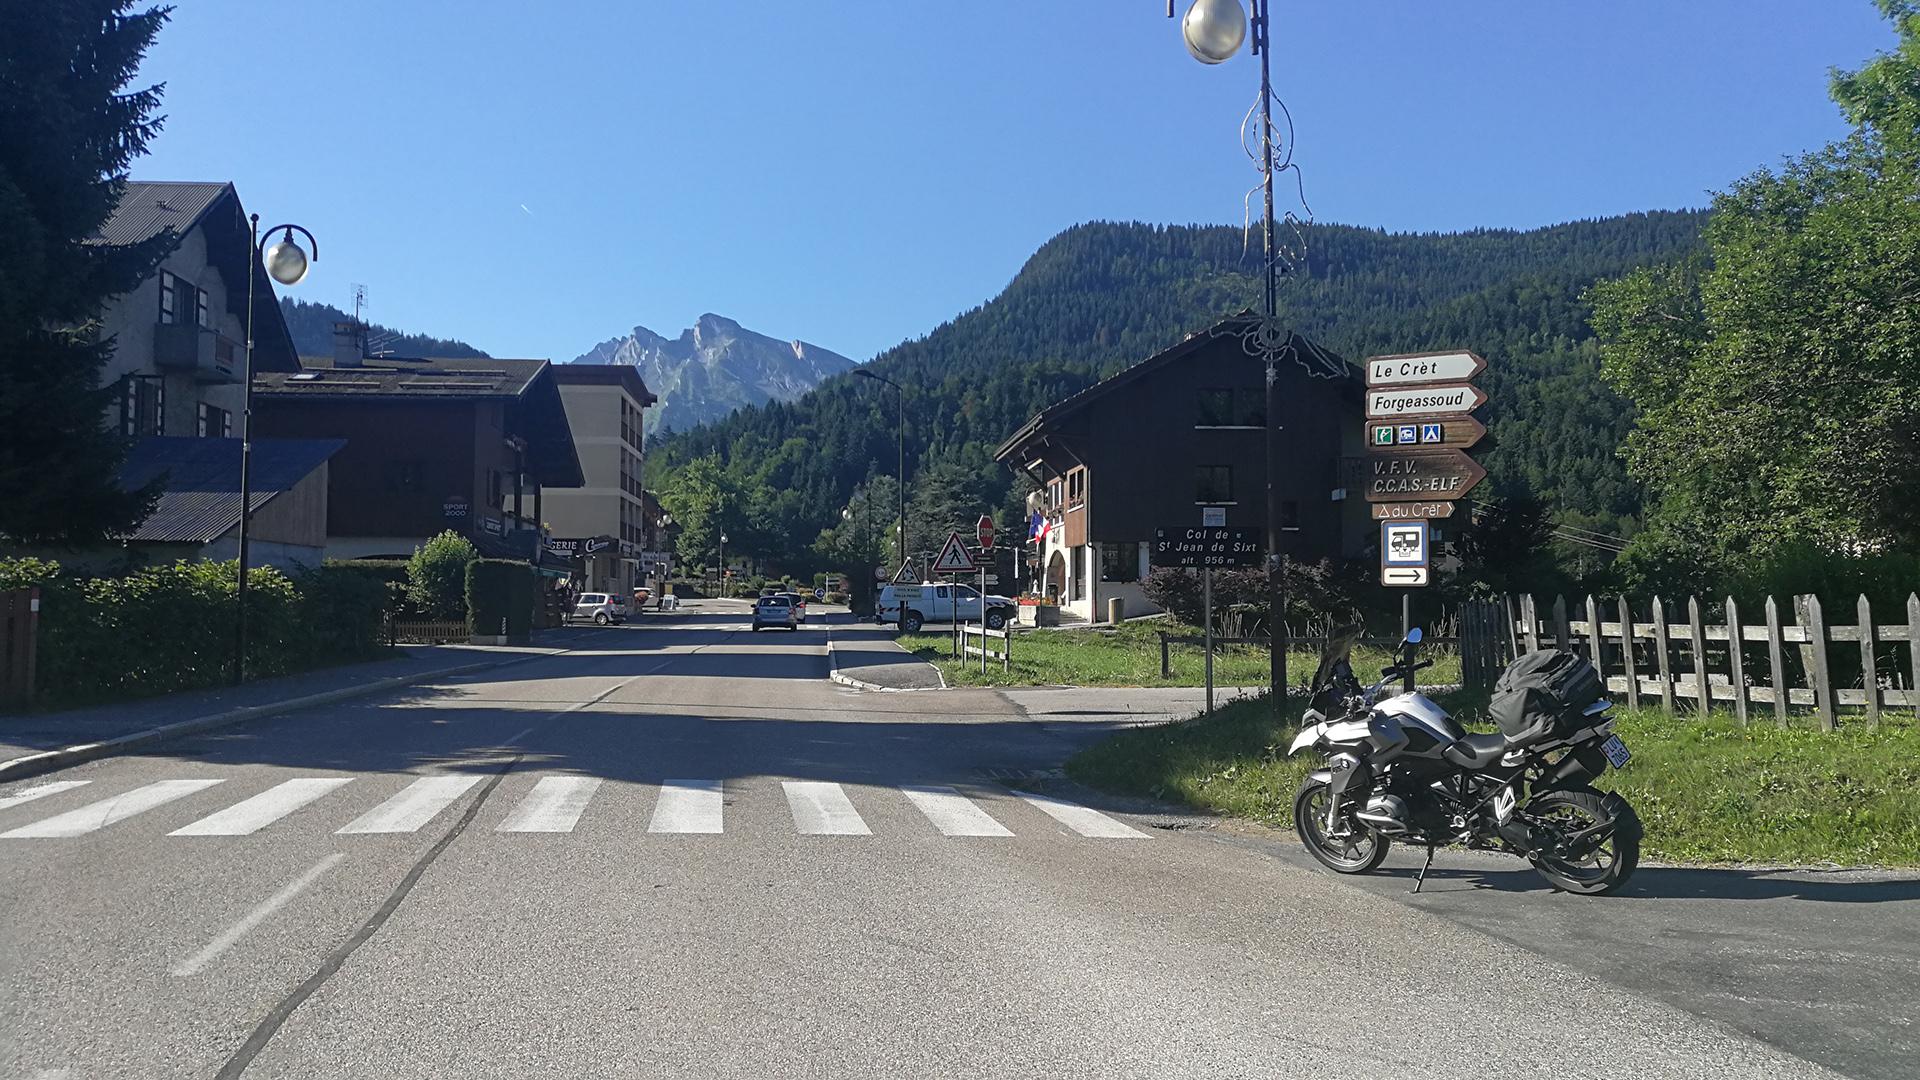 0956 - F - Col de Saint-Jean-de-Sixt